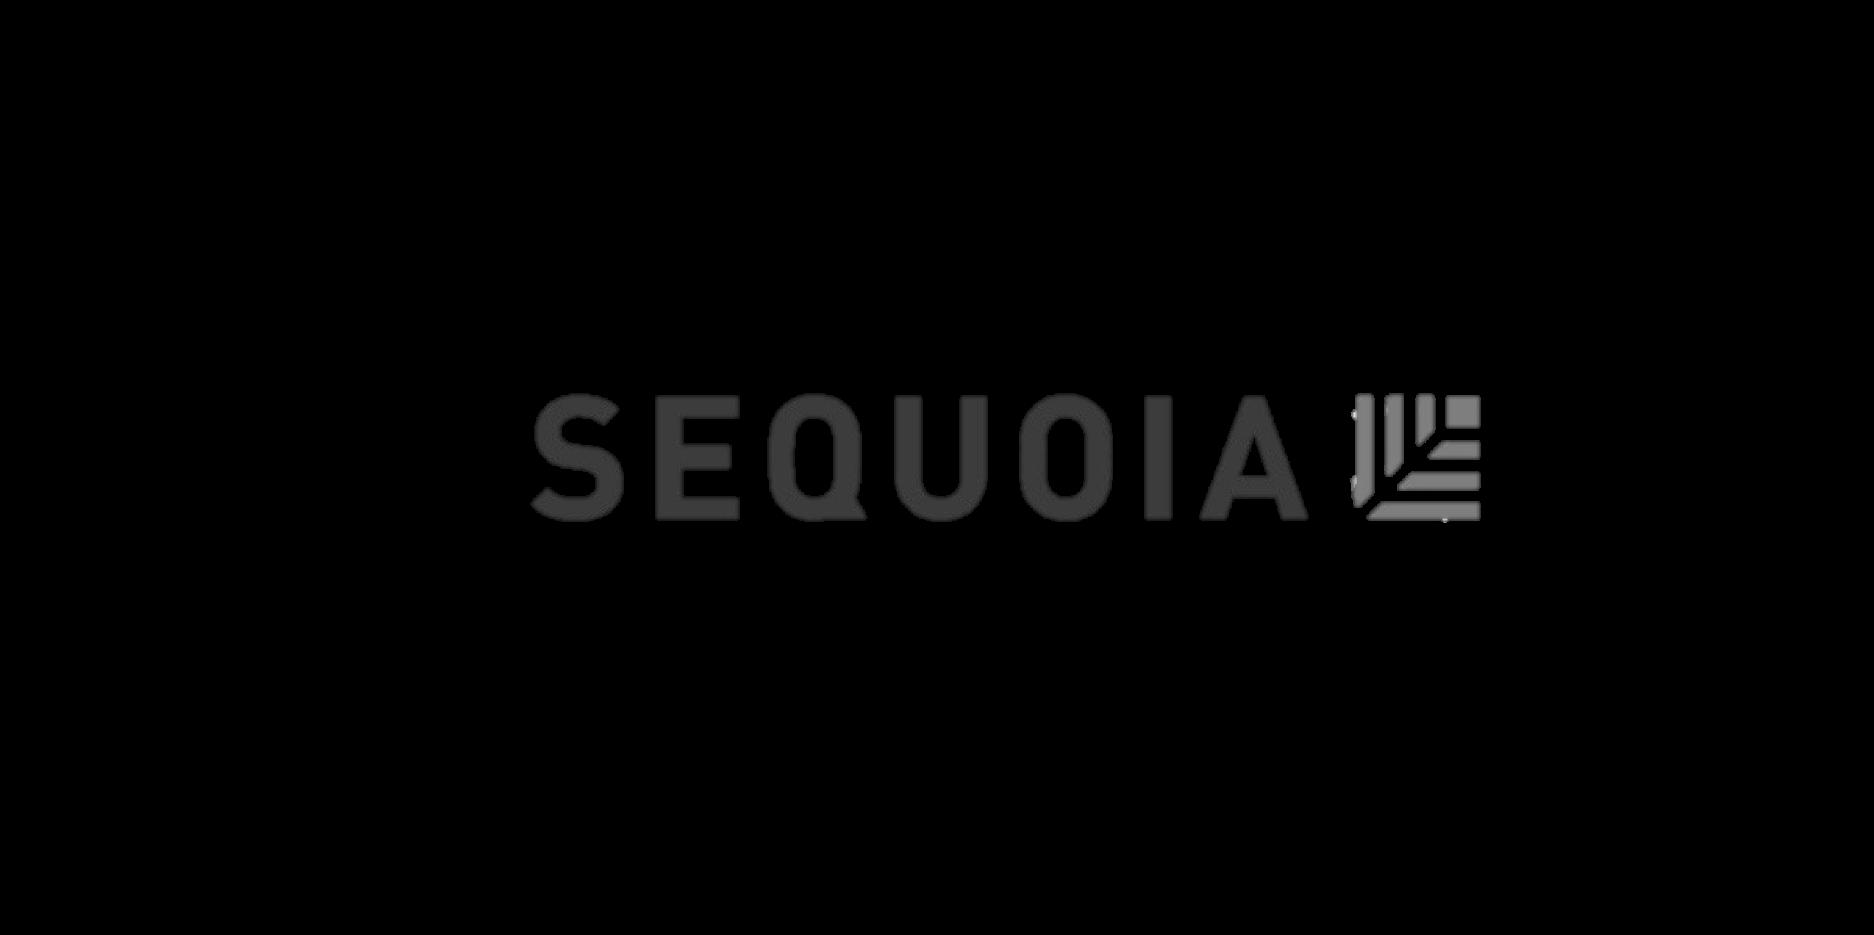 Sequoia Capital B&W logo.png